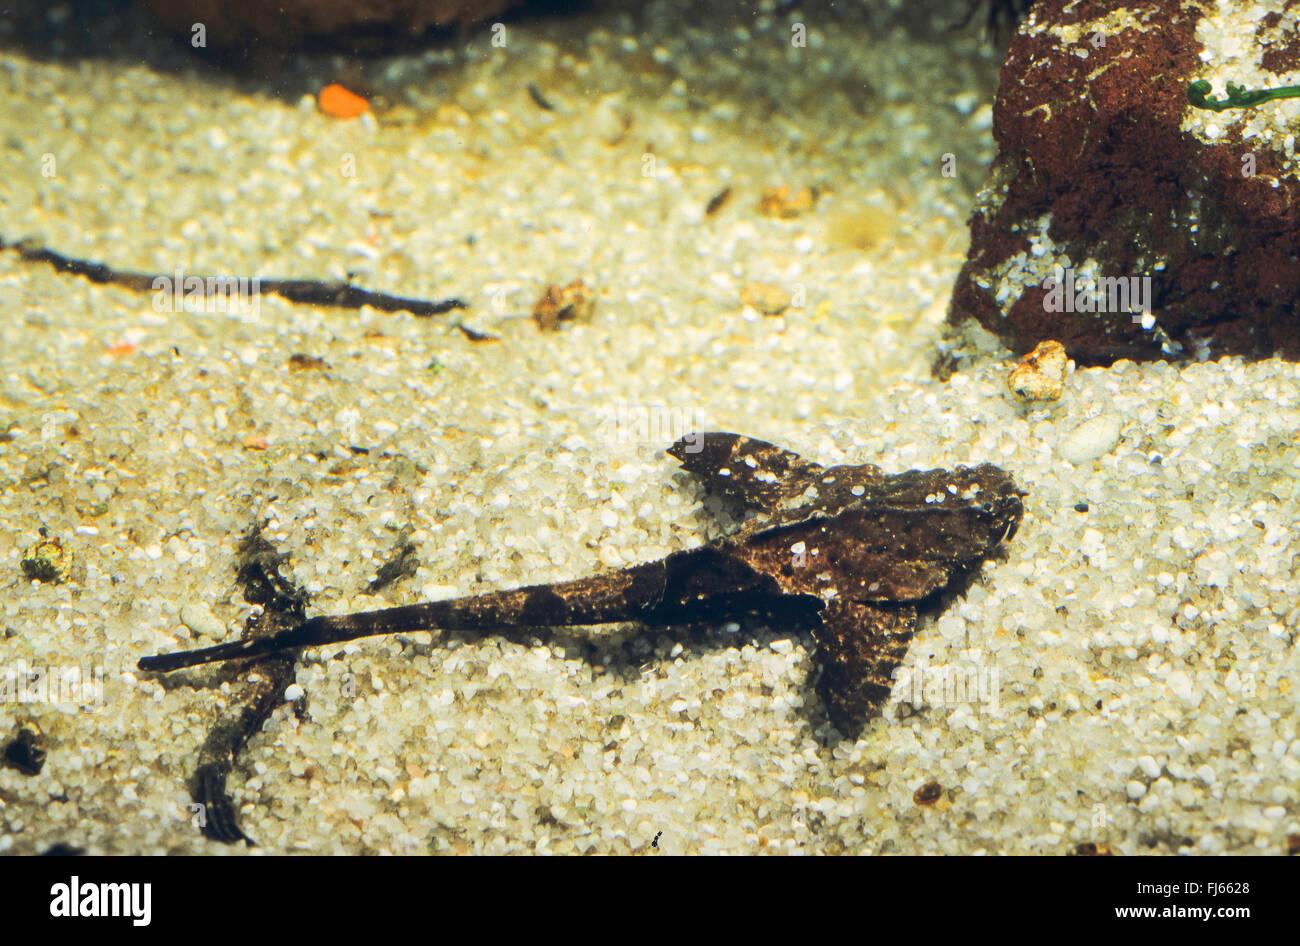 Banjo Catfish (Dysichthys coracoideus, Bunocephalus coracoideus, Bunocephalus bicolor, Dysichthys bicolor), rests - Stock Image